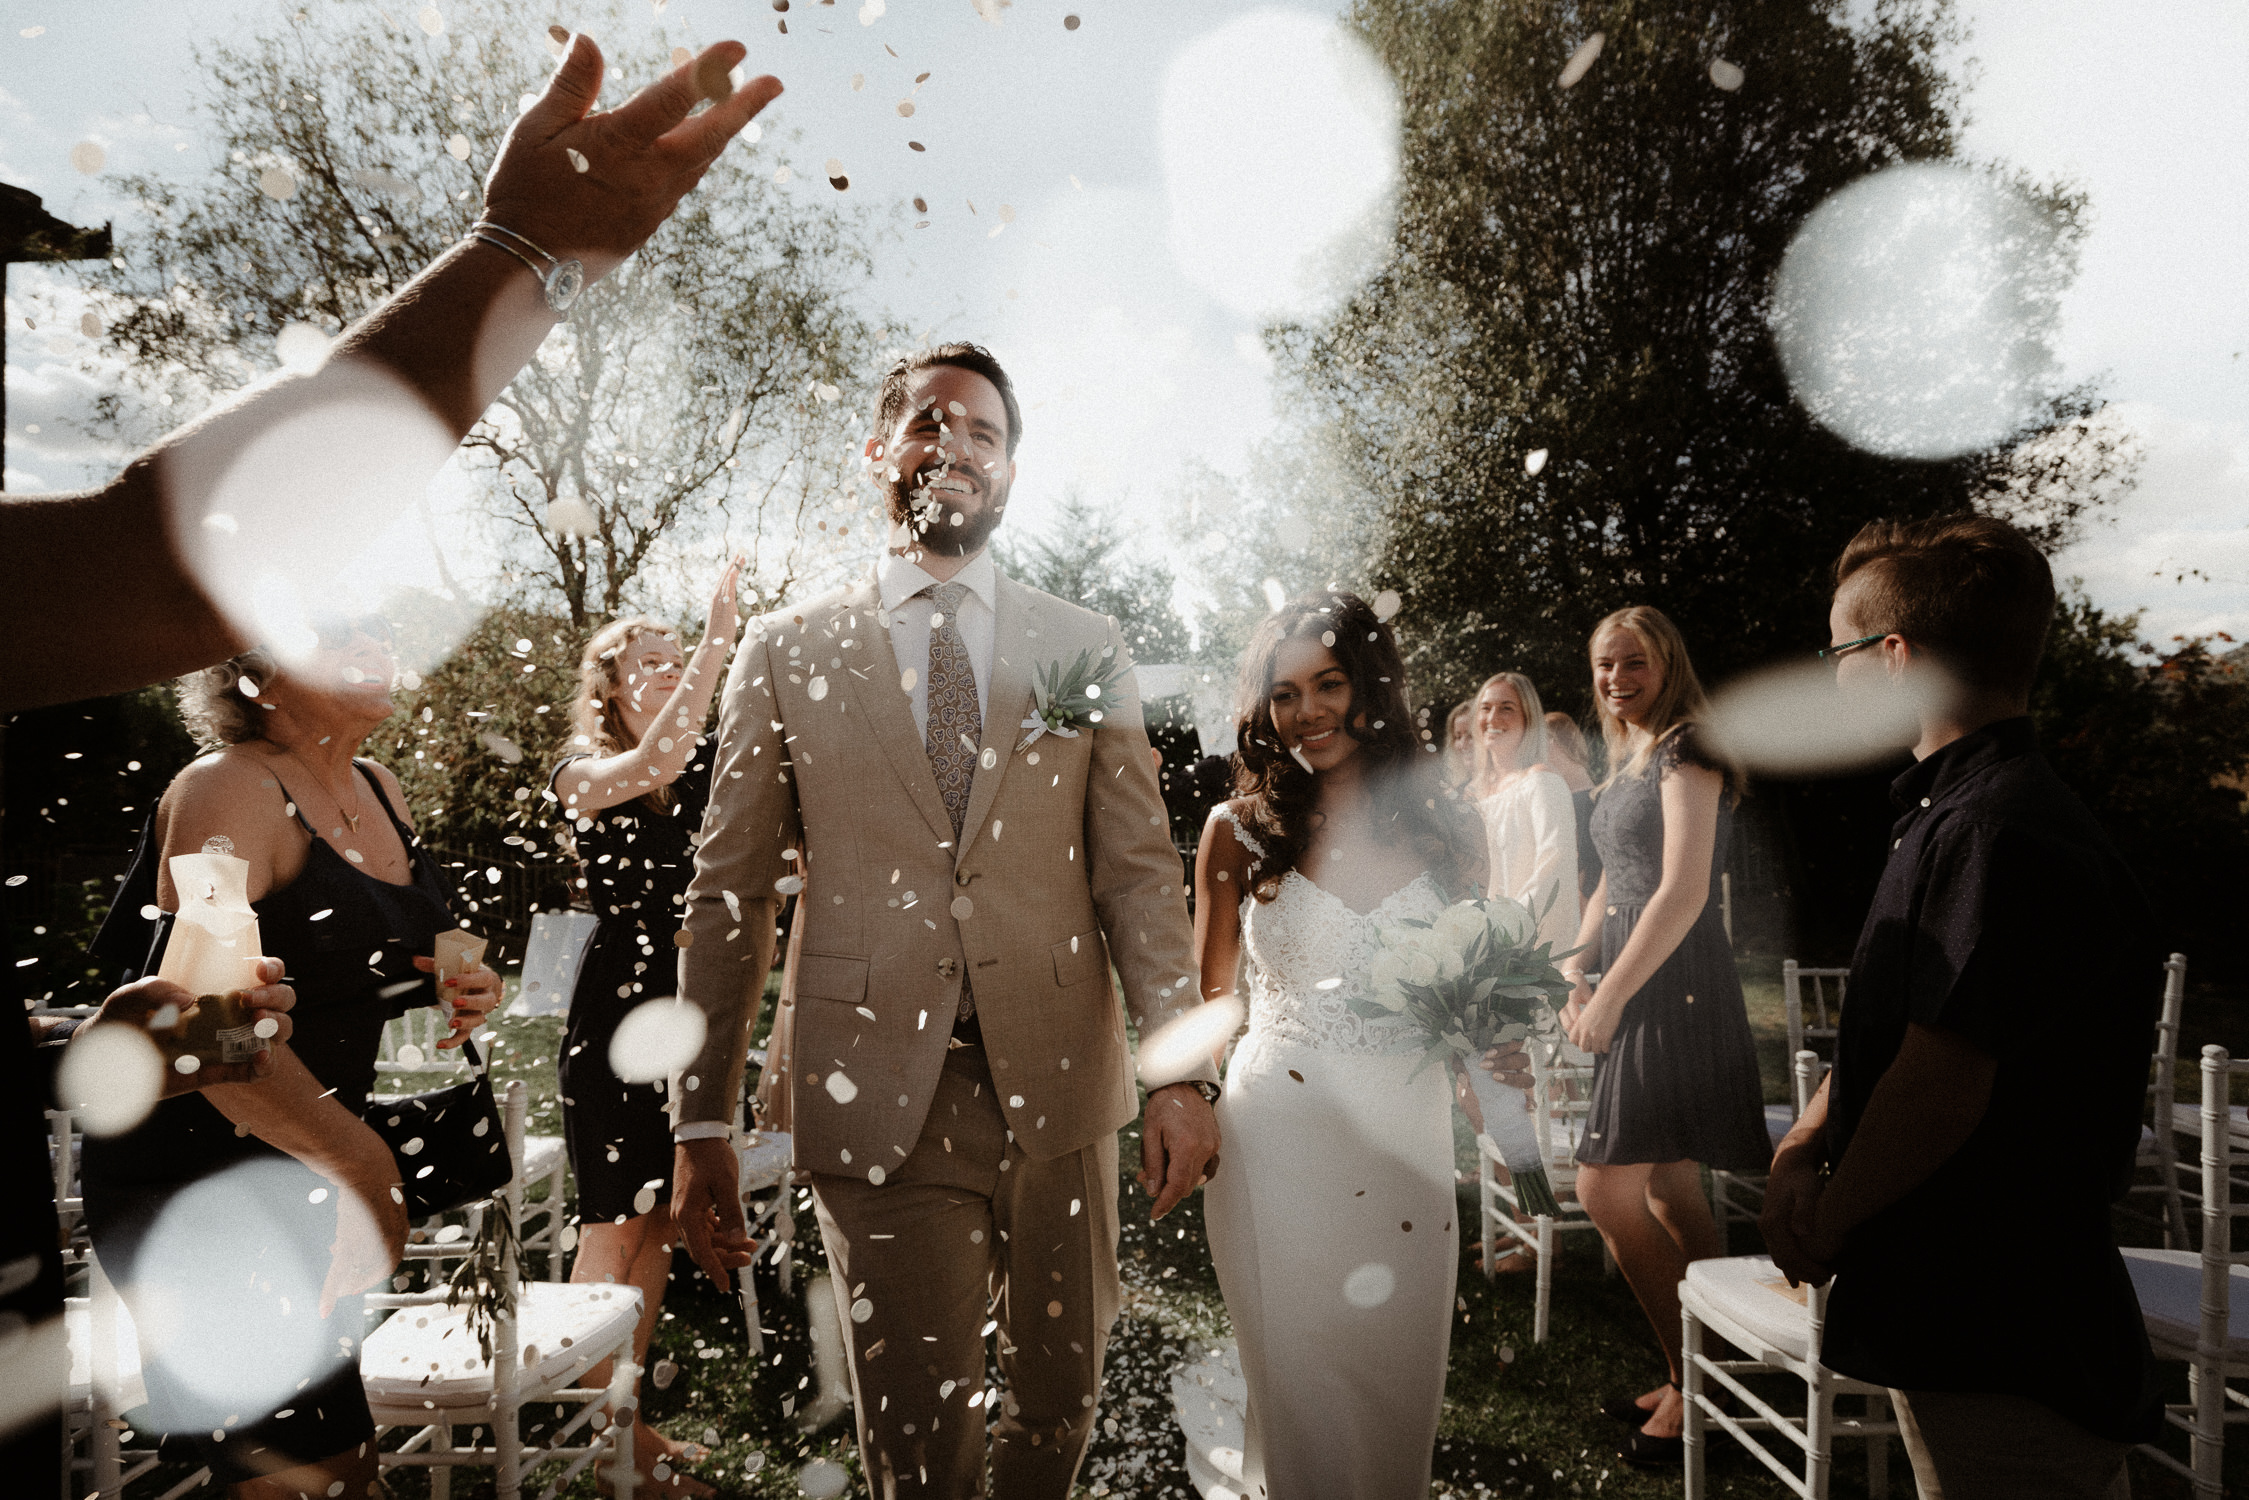 bruidspaar met confetti het beste bruidsfotograaf uit amsterdam en utrecht